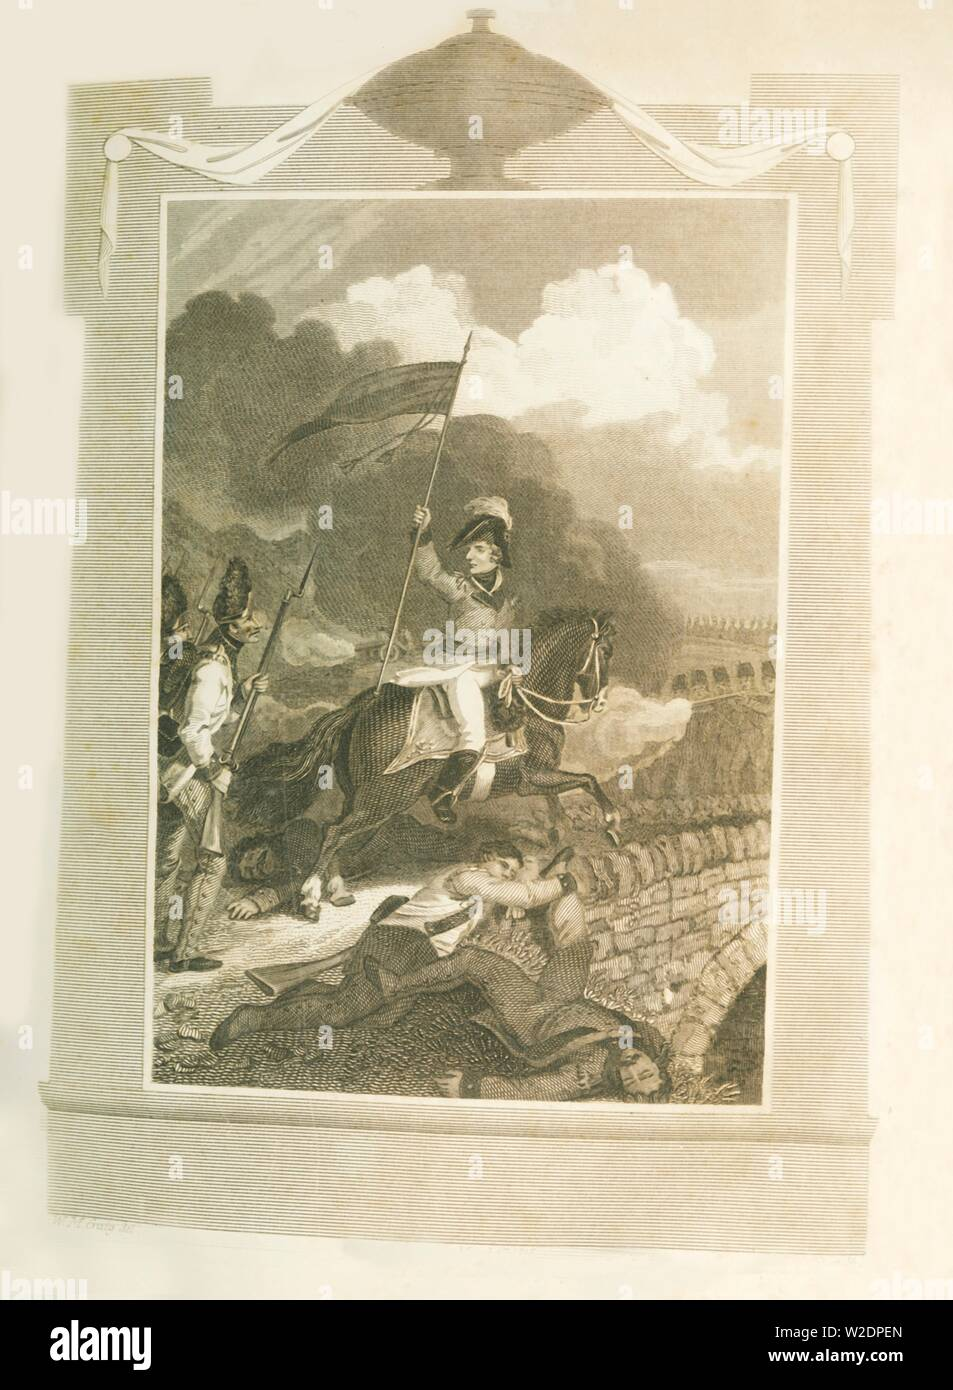 'Buonaparte atttempting to force the Bridge of Arcola', (1796), 1816. Creator: Unknown. Stock Photo